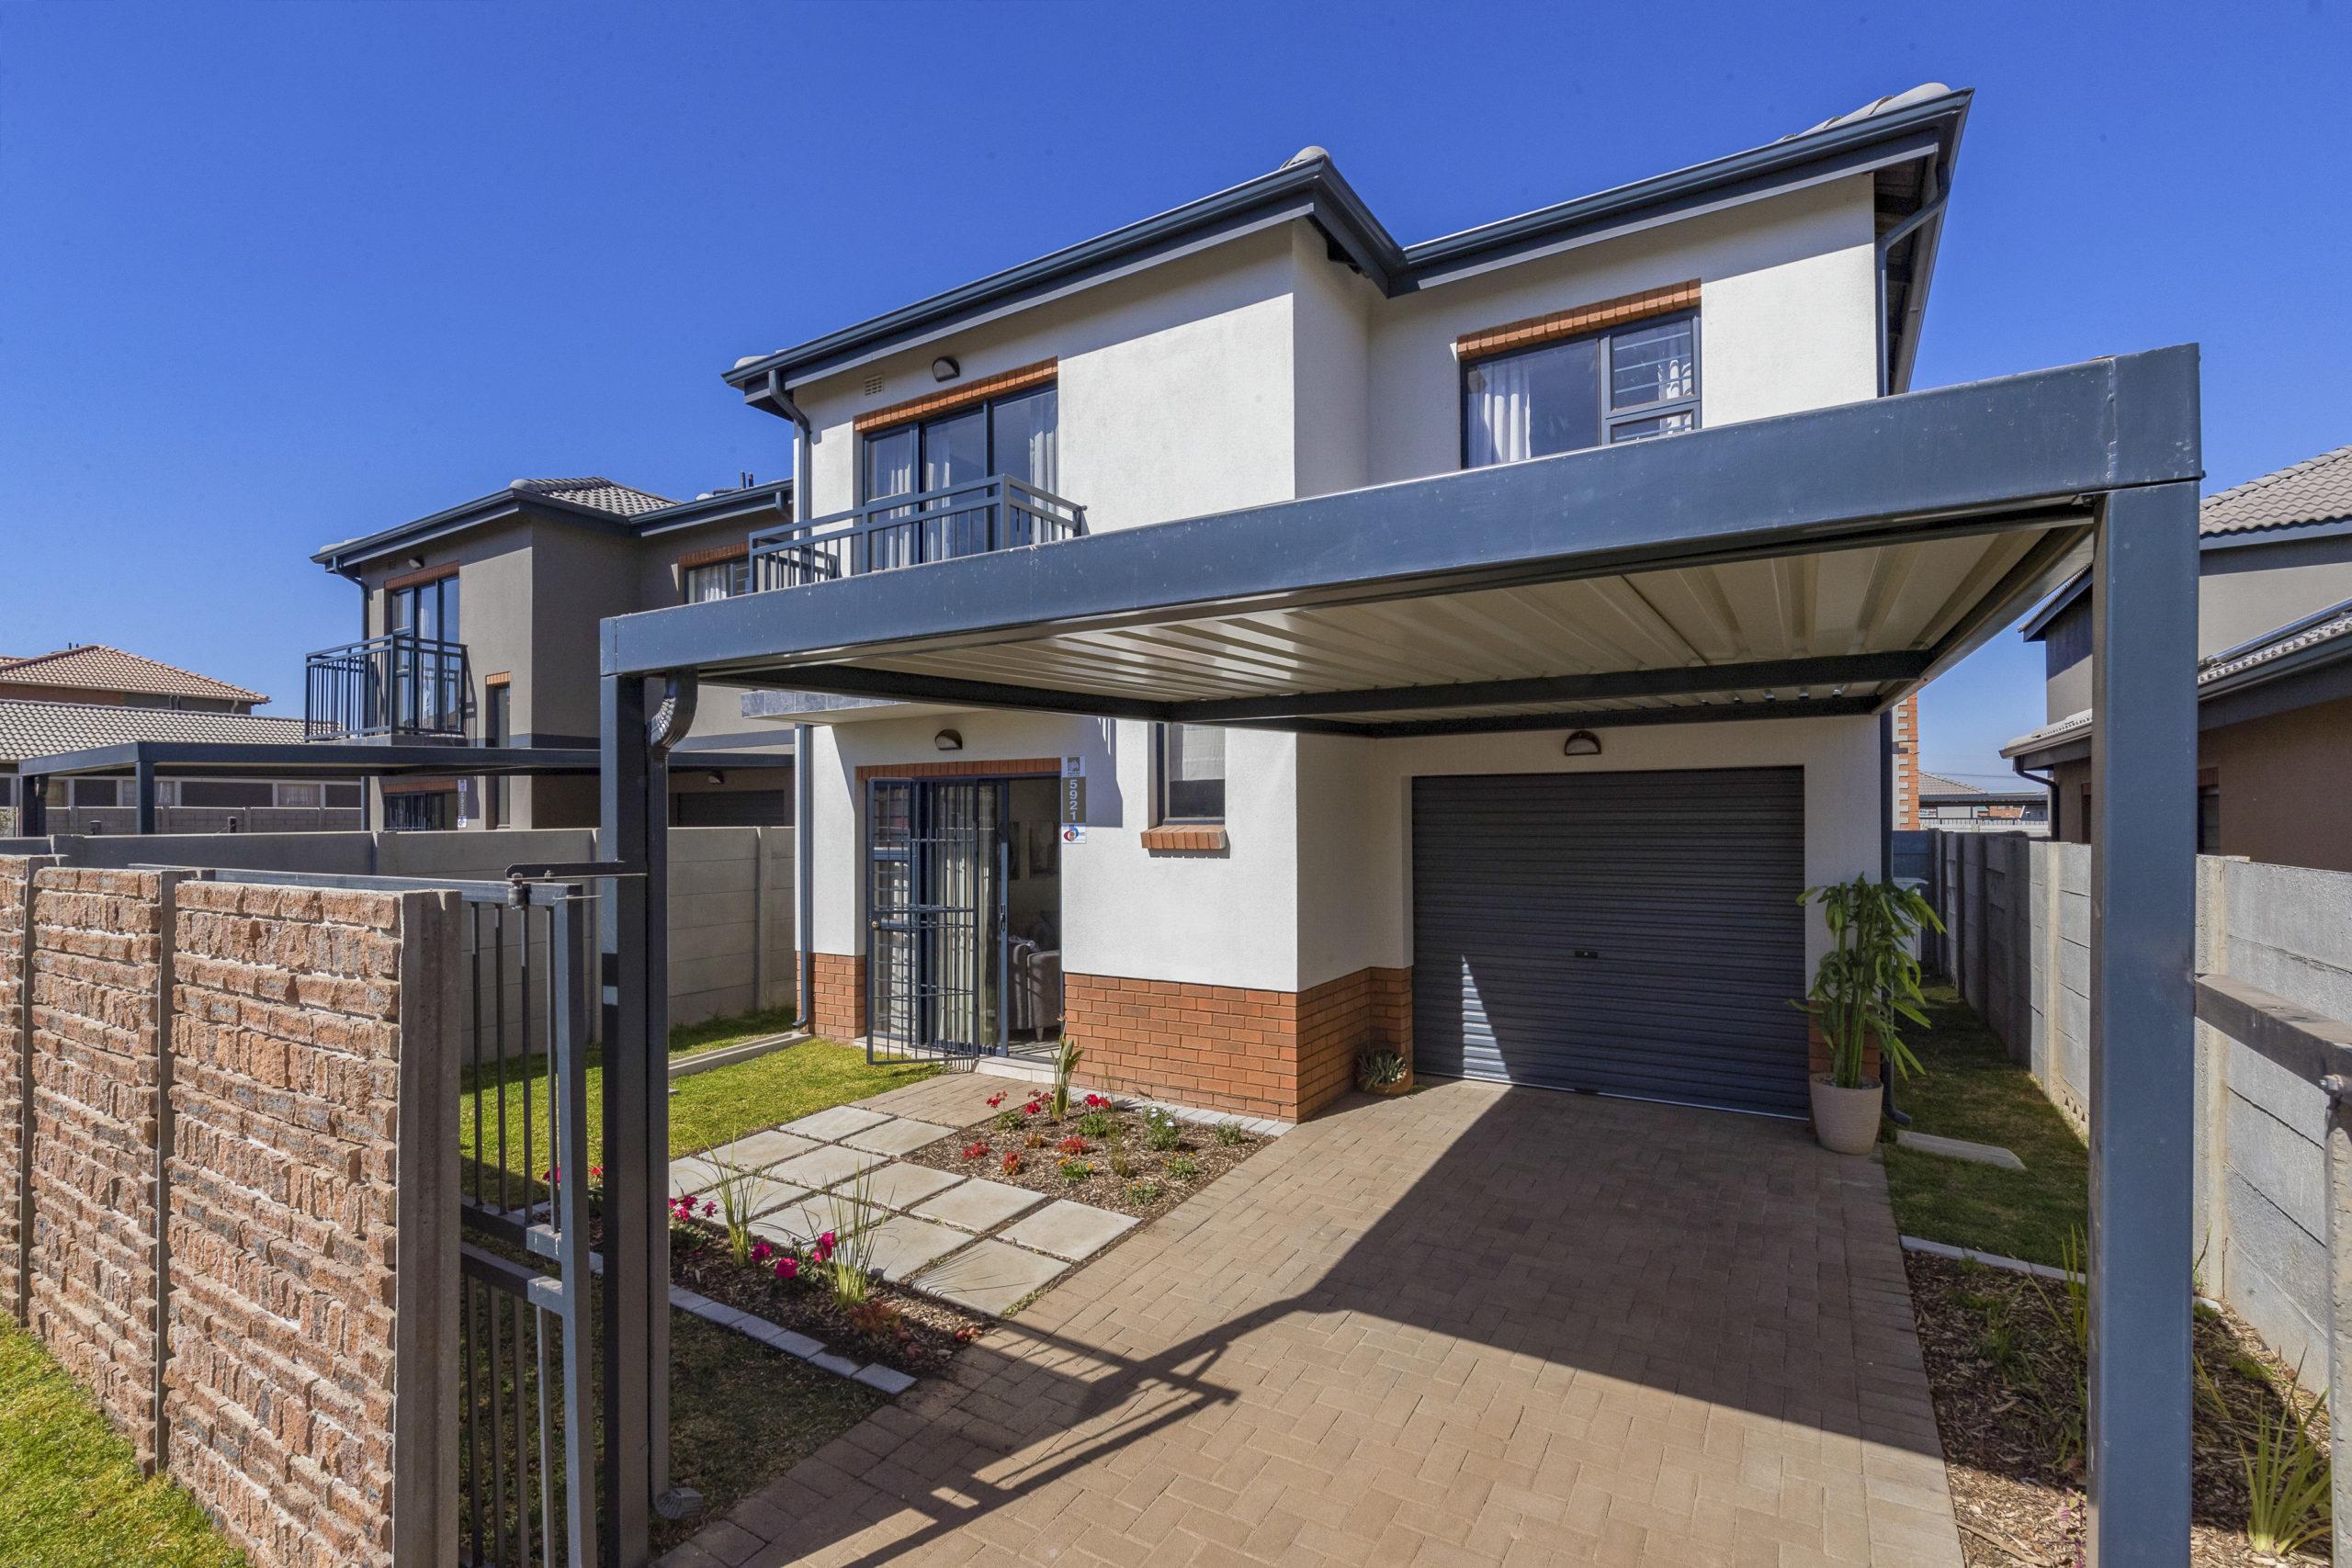 Leopard's Rest, Homes for Sale in Alberton, Gauteng - Exterior Duplex